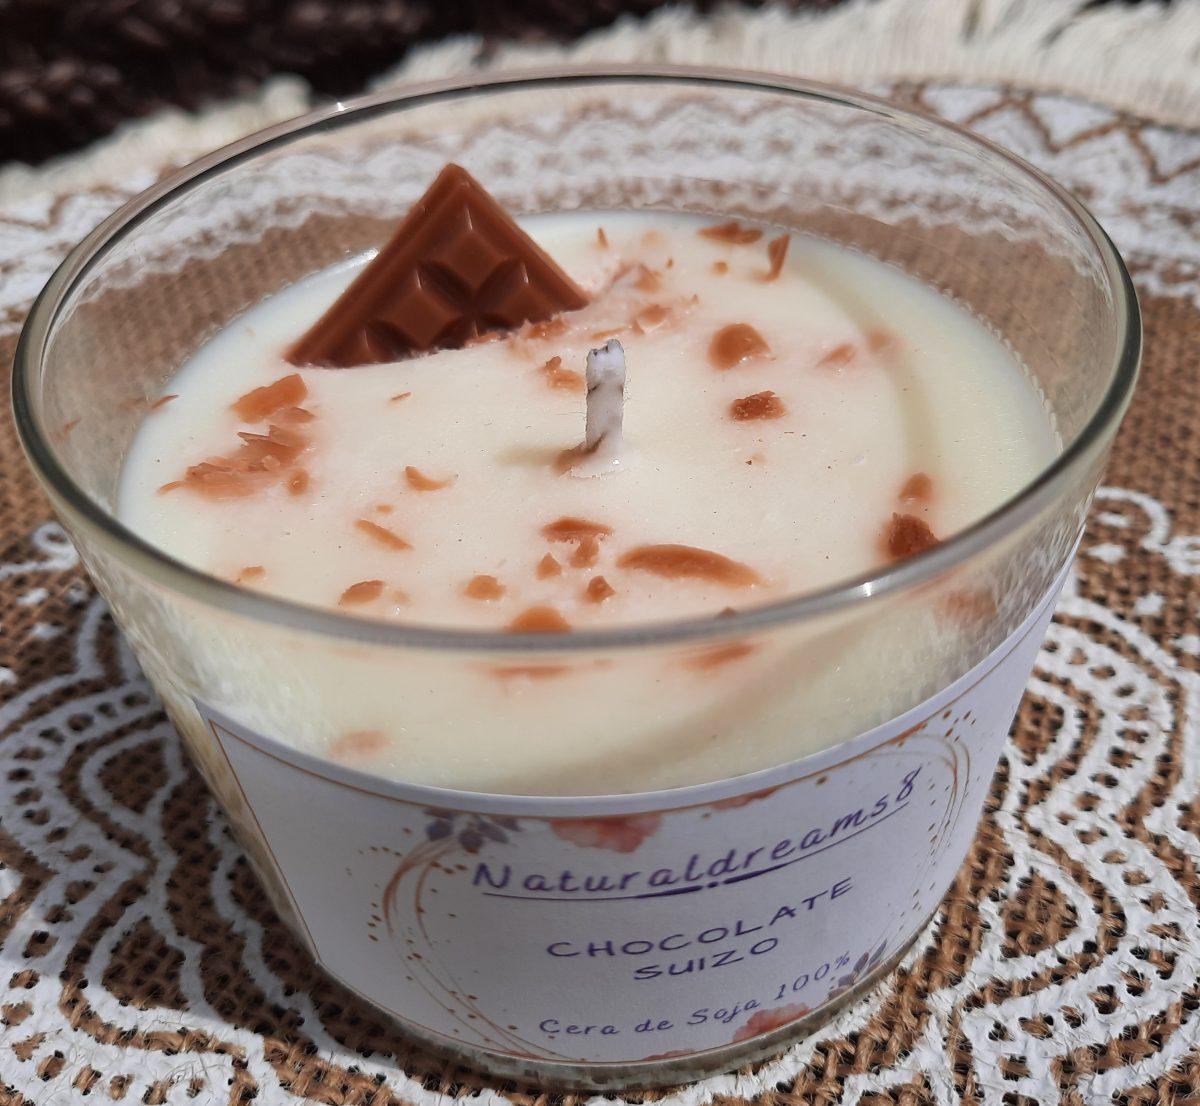 Cera de Soja Chocolate Suizo